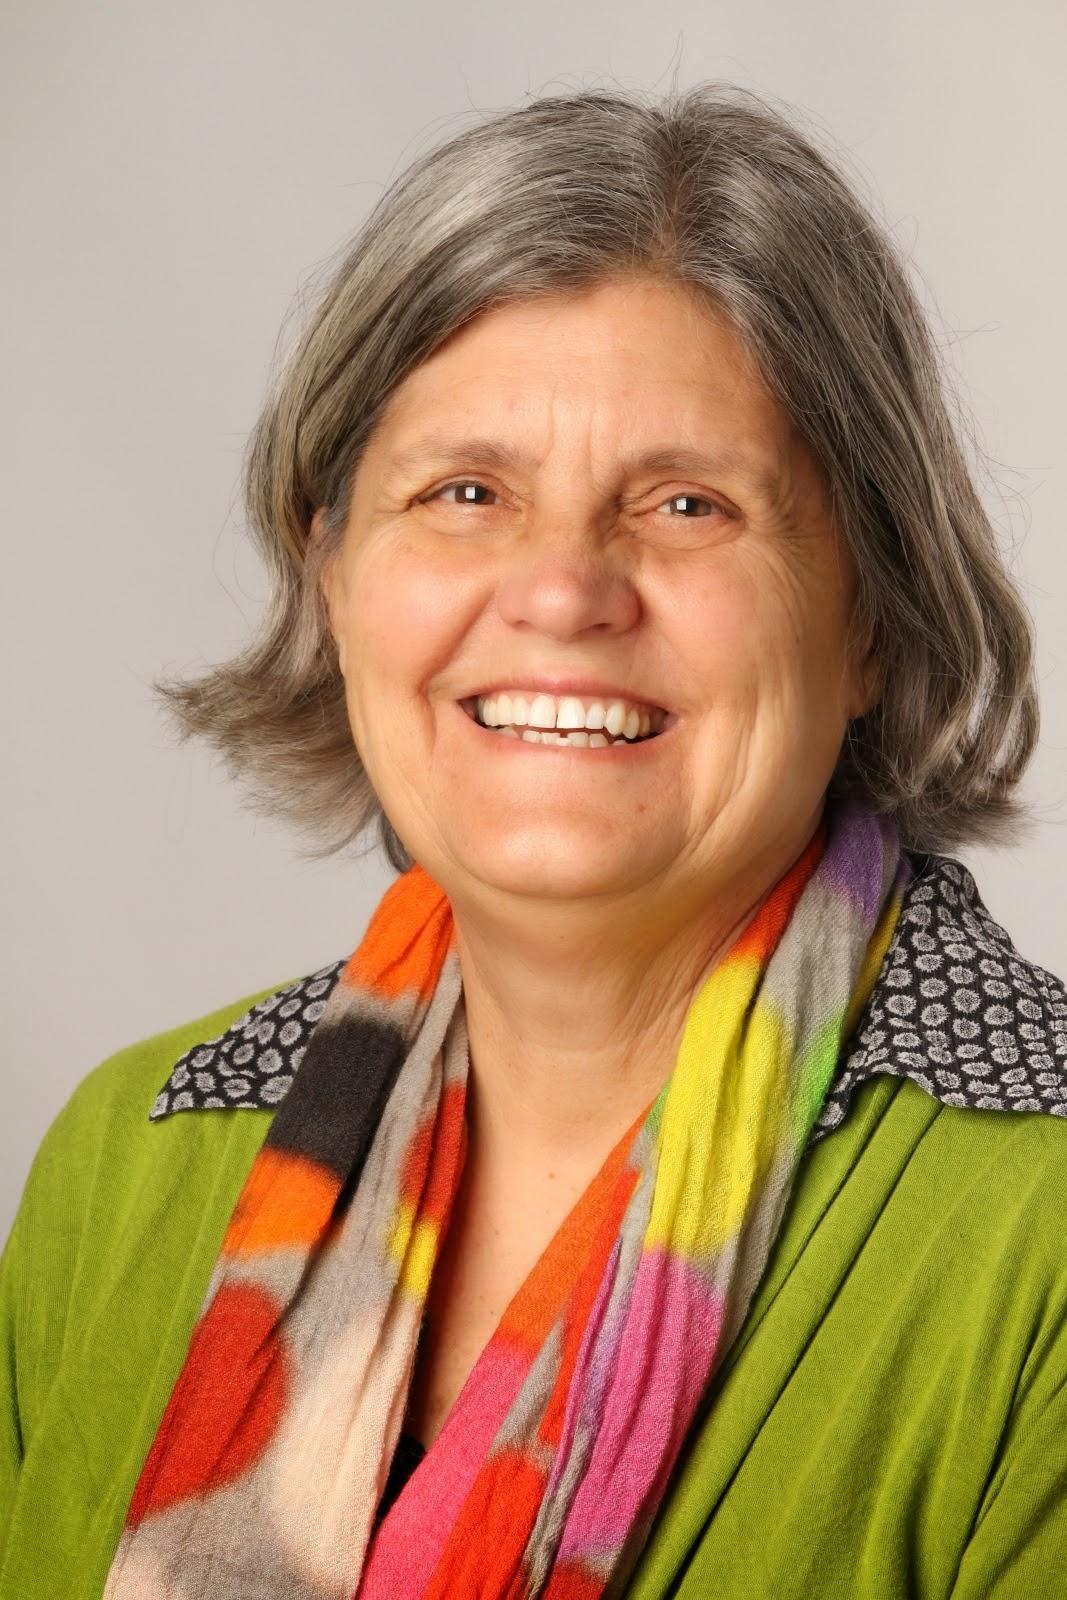 Jennie Boisvert